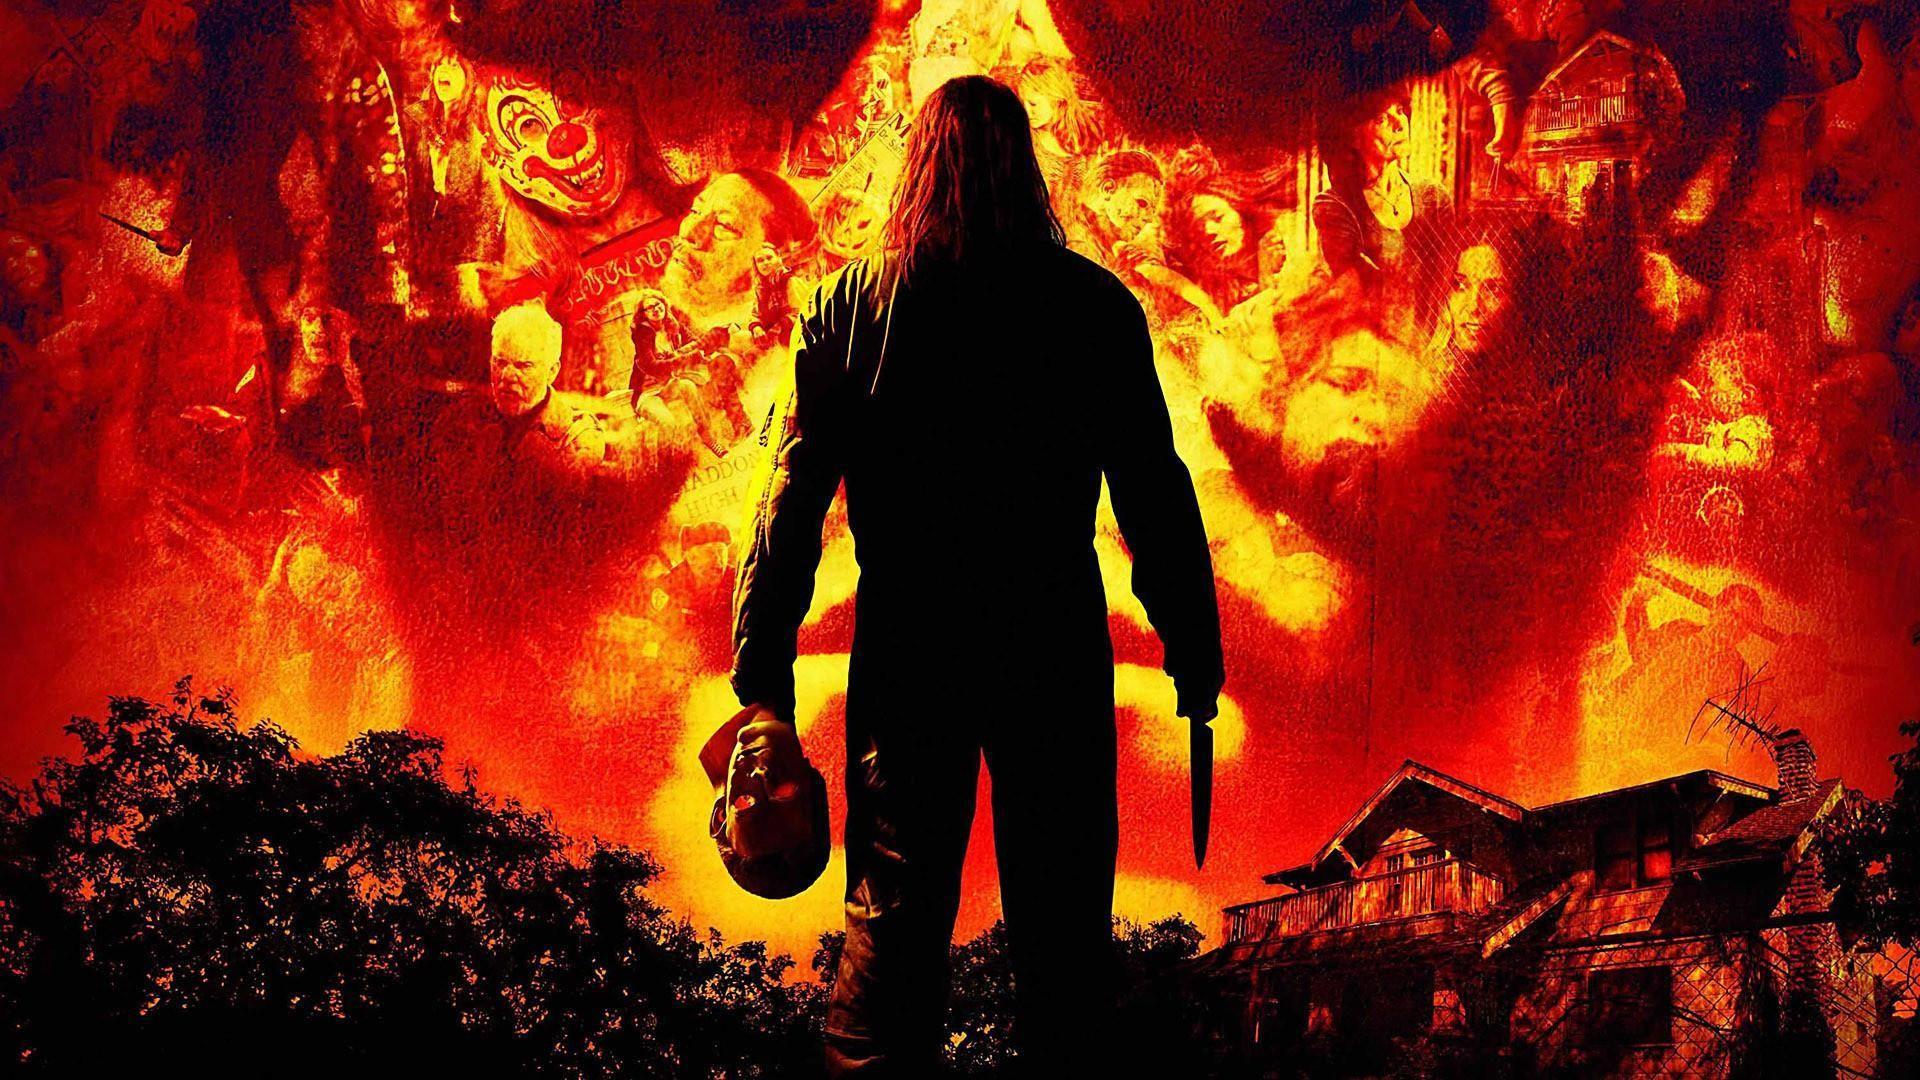 Backgrounds For Halloween Movie Desktop Backgrounds | www … Backgrounds  For Halloween Movie Desktop Backgrounds